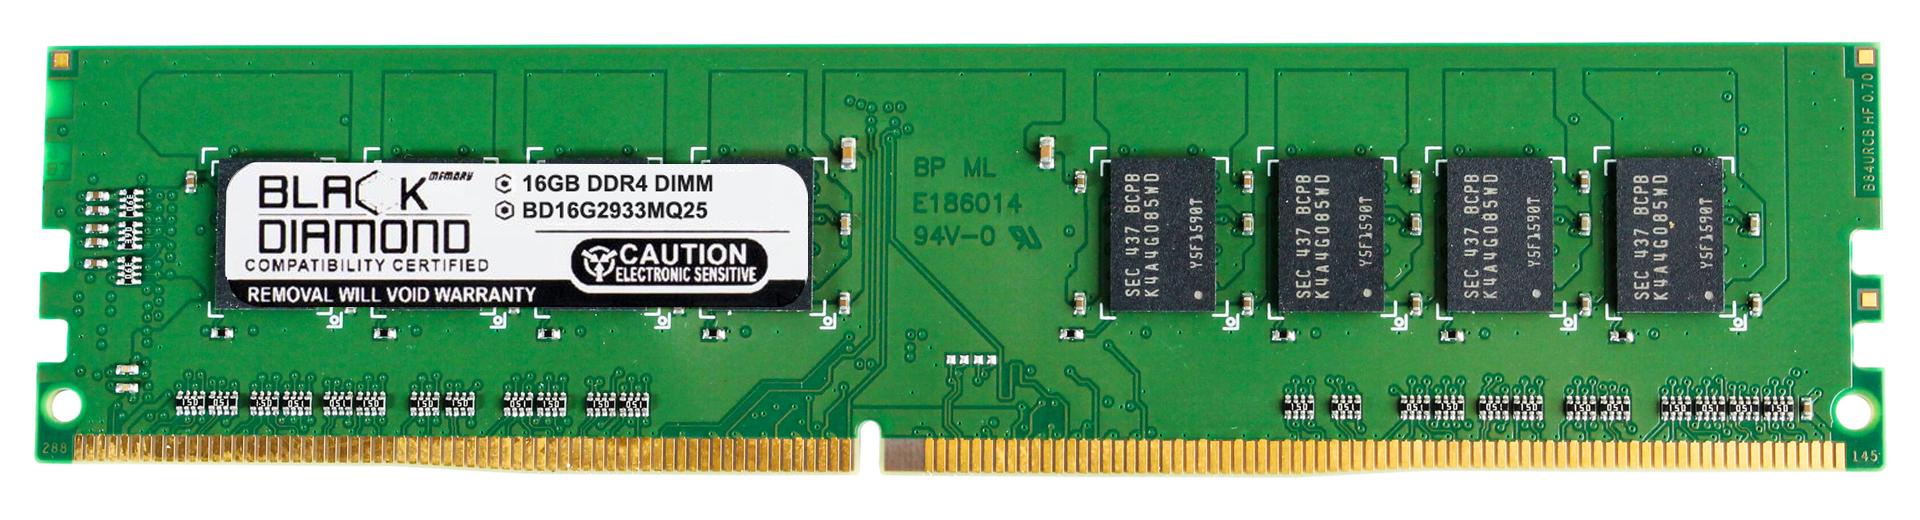 2GB EVGA nForce 650i 680i SLI 775 Memory Ram